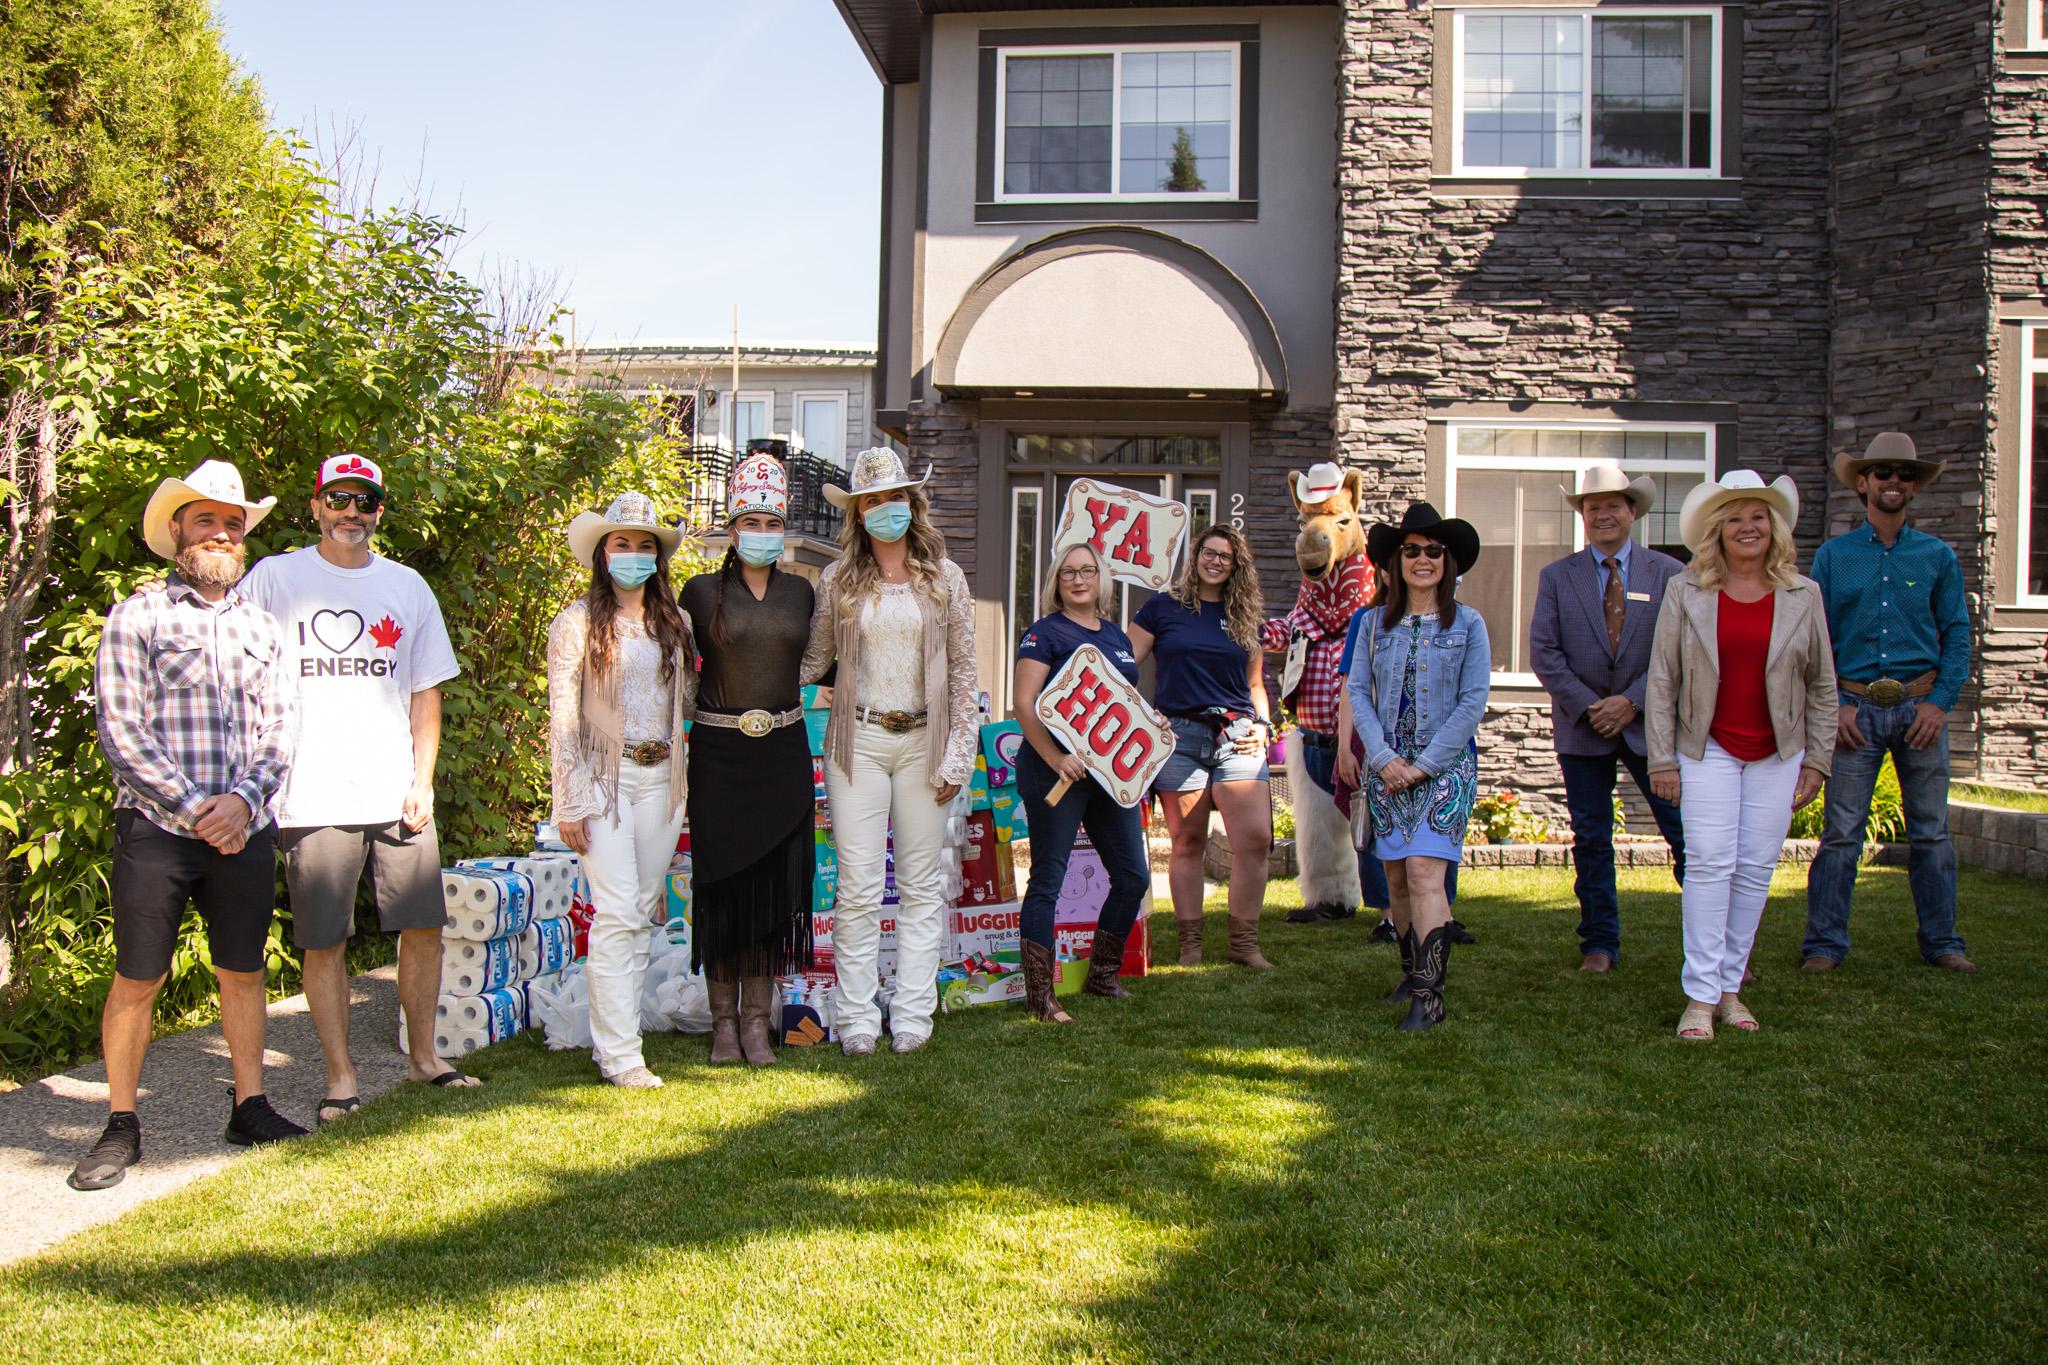 Group shot of individuals with Ya Hoo signs at a donation pick up spot